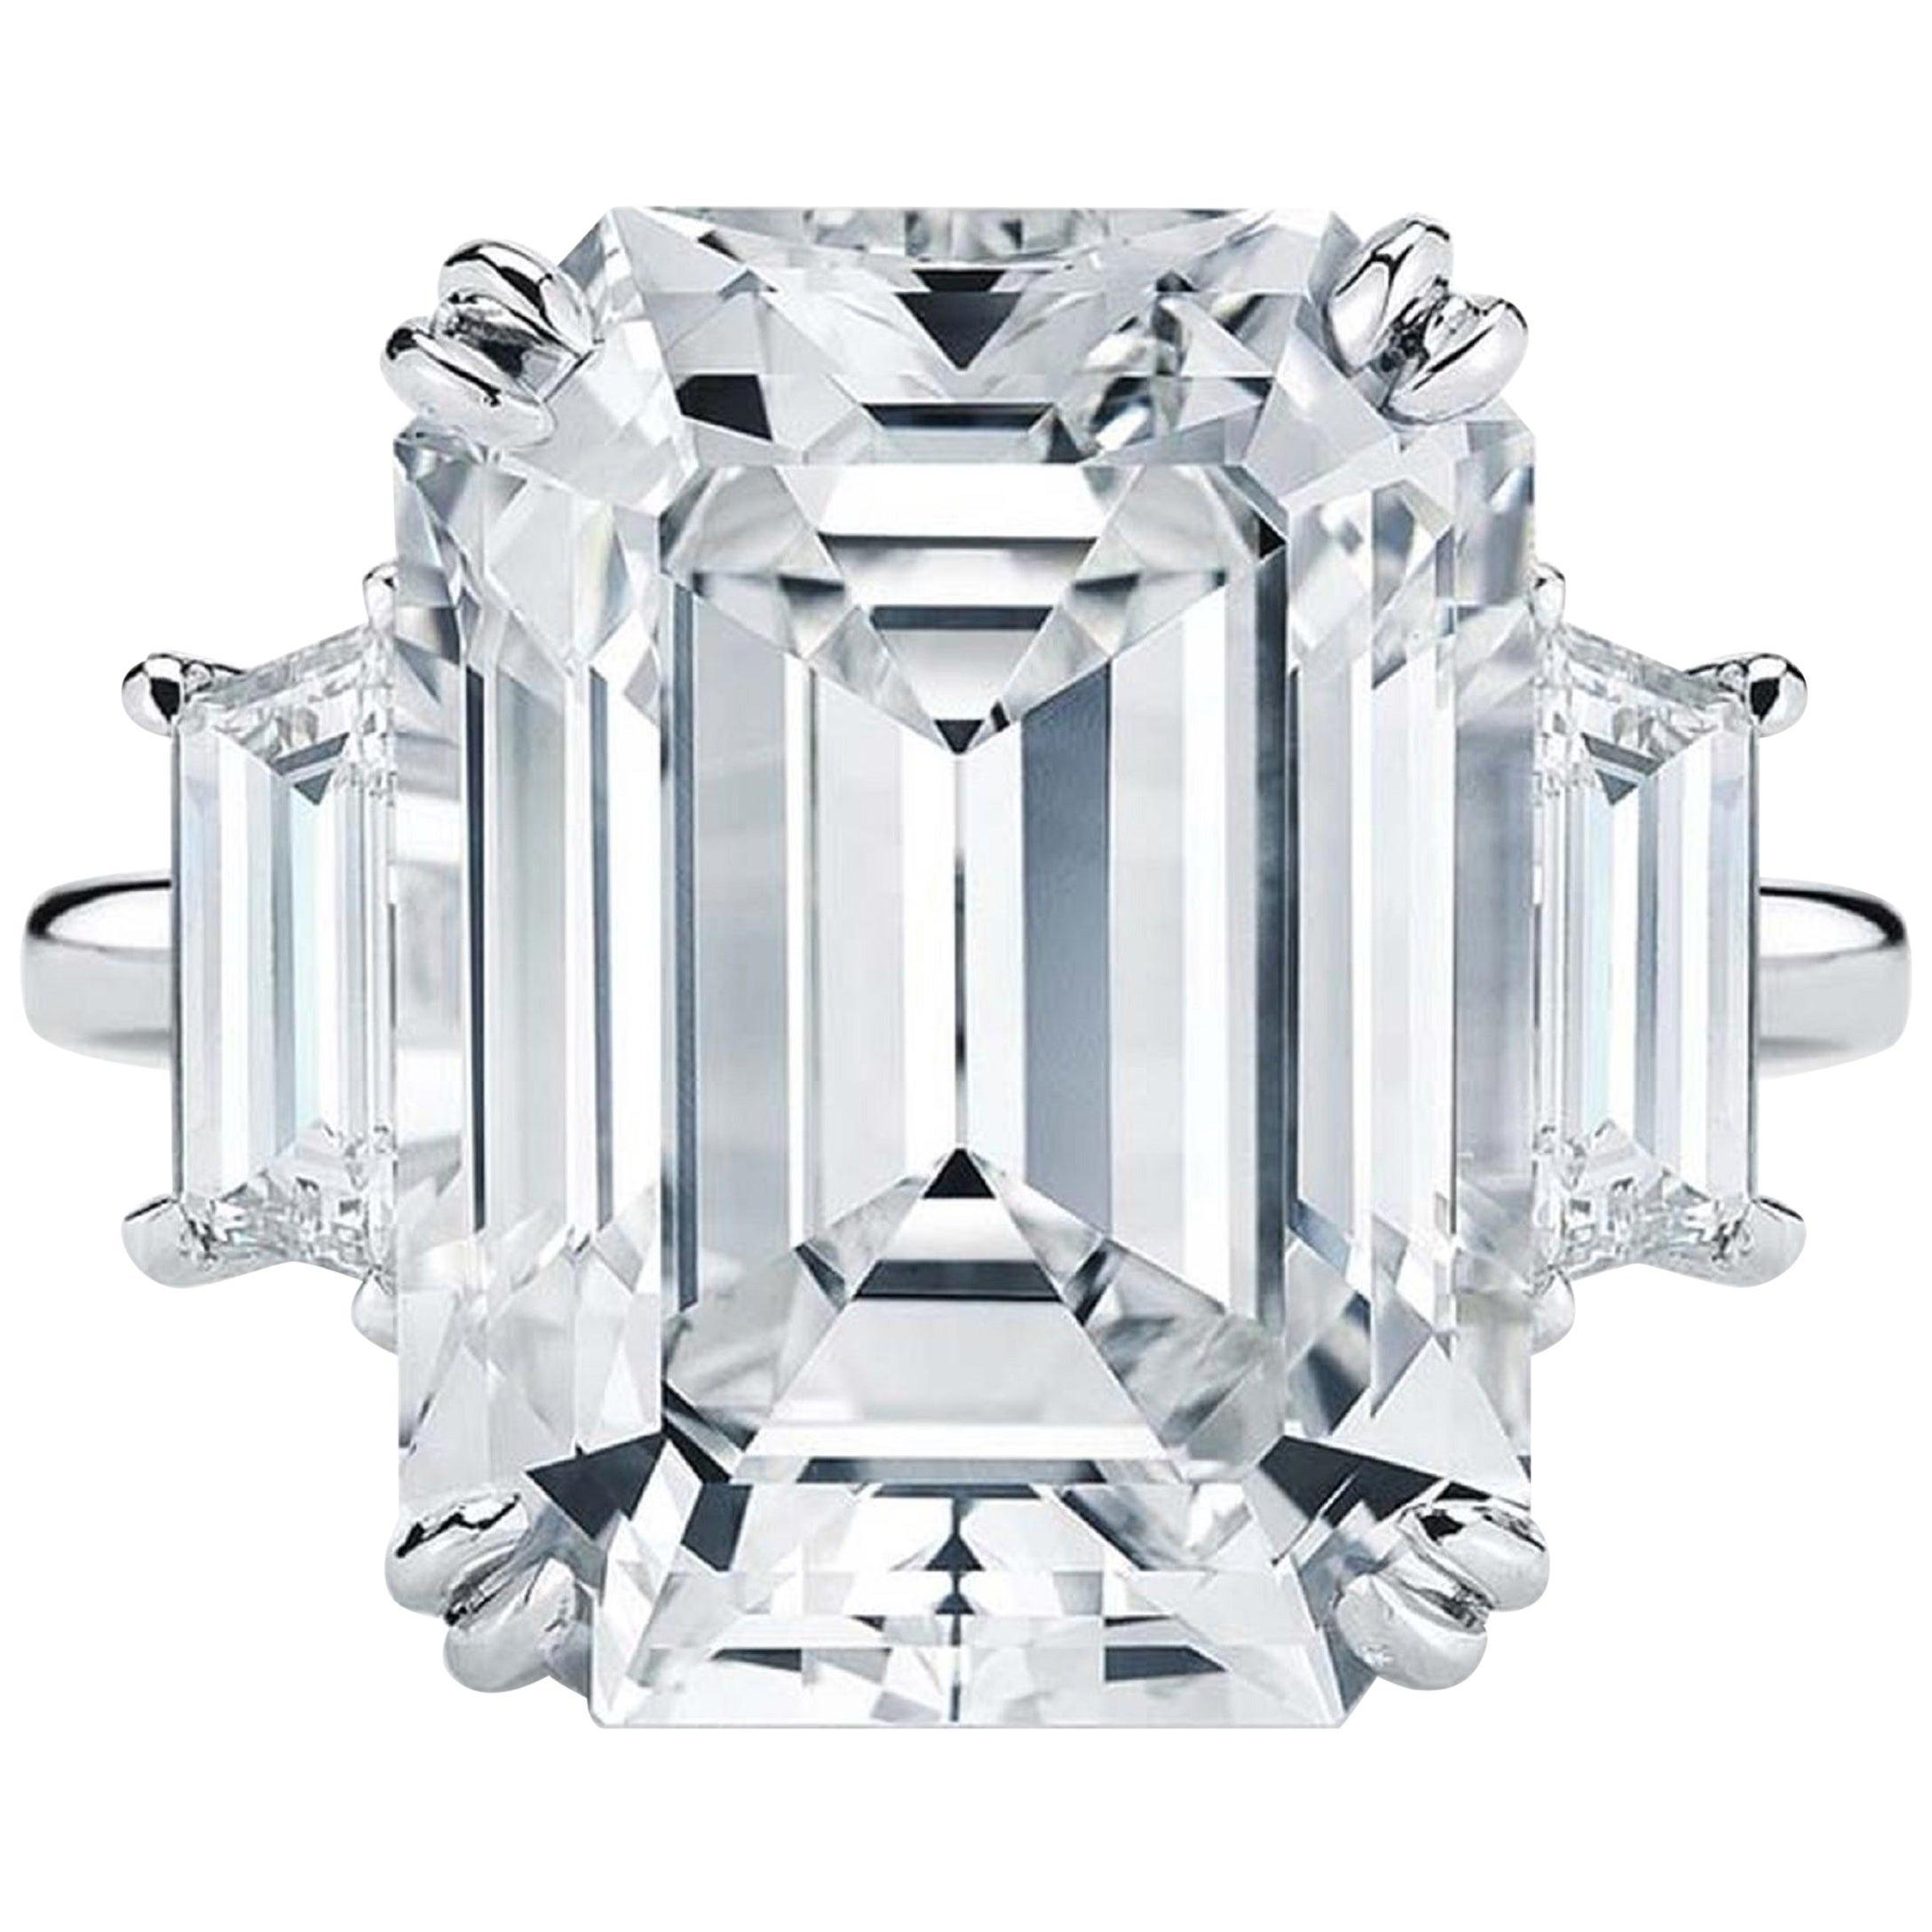 GIA Certified 4 Carat Three-Stone Emerald Cut Trapezoid Platinum Ring